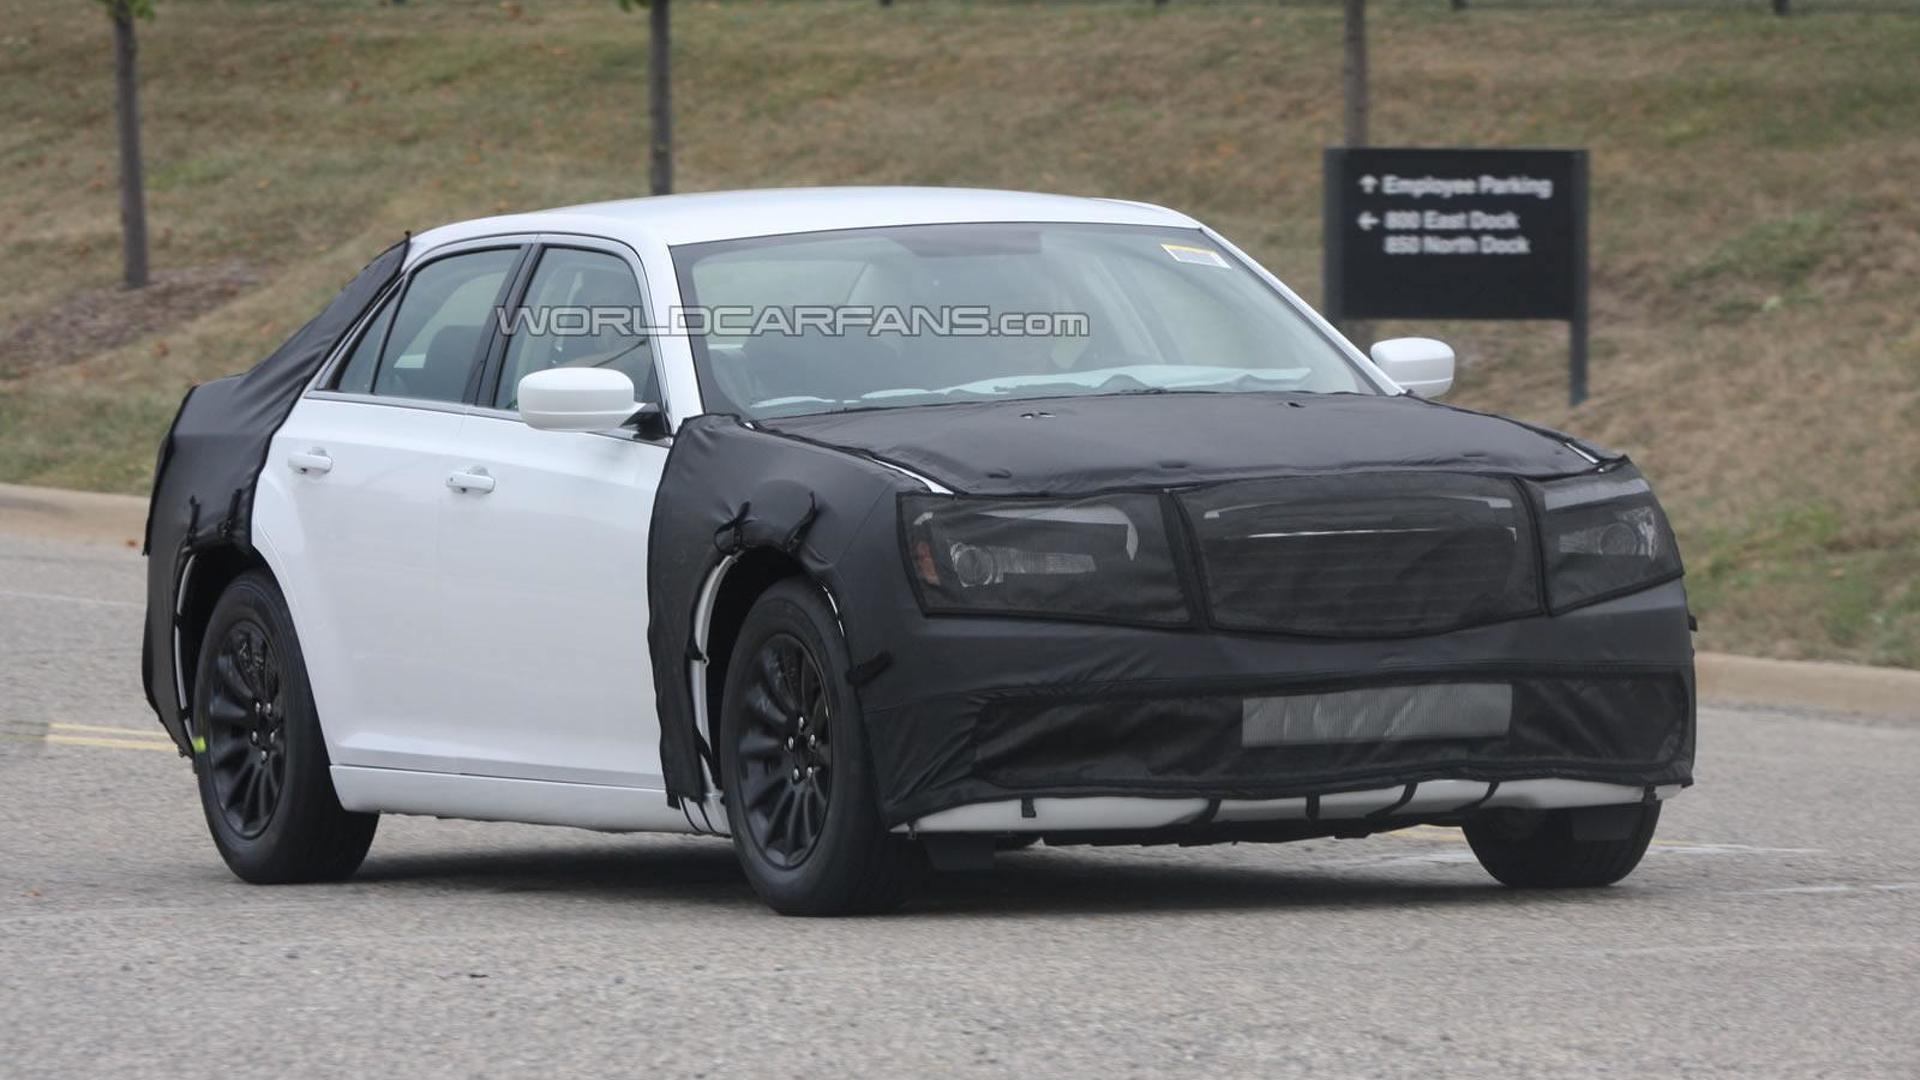 2012 Next generation Chrysler 300 spied